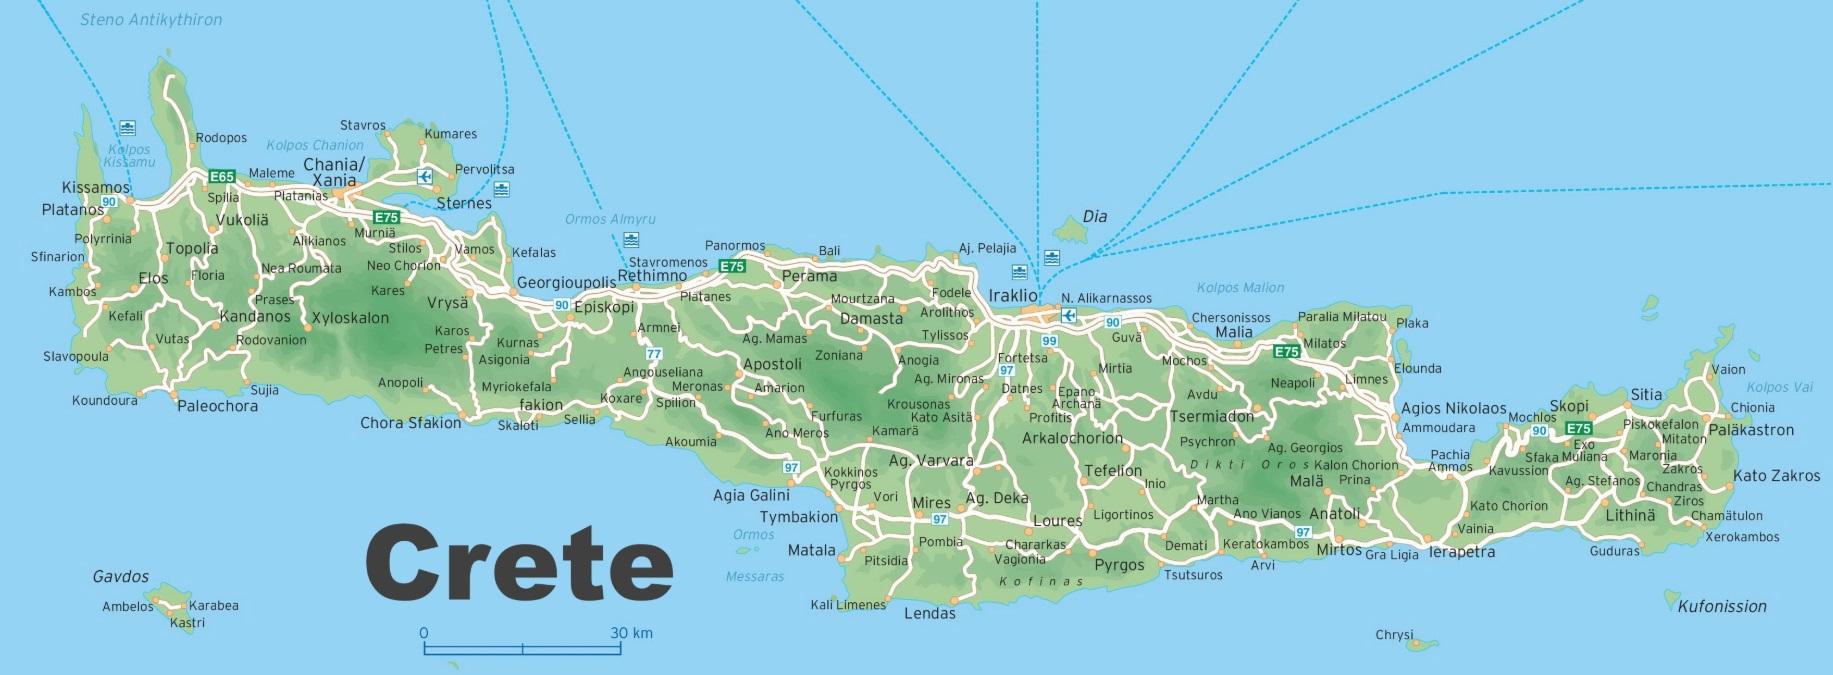 Mapa Kréty